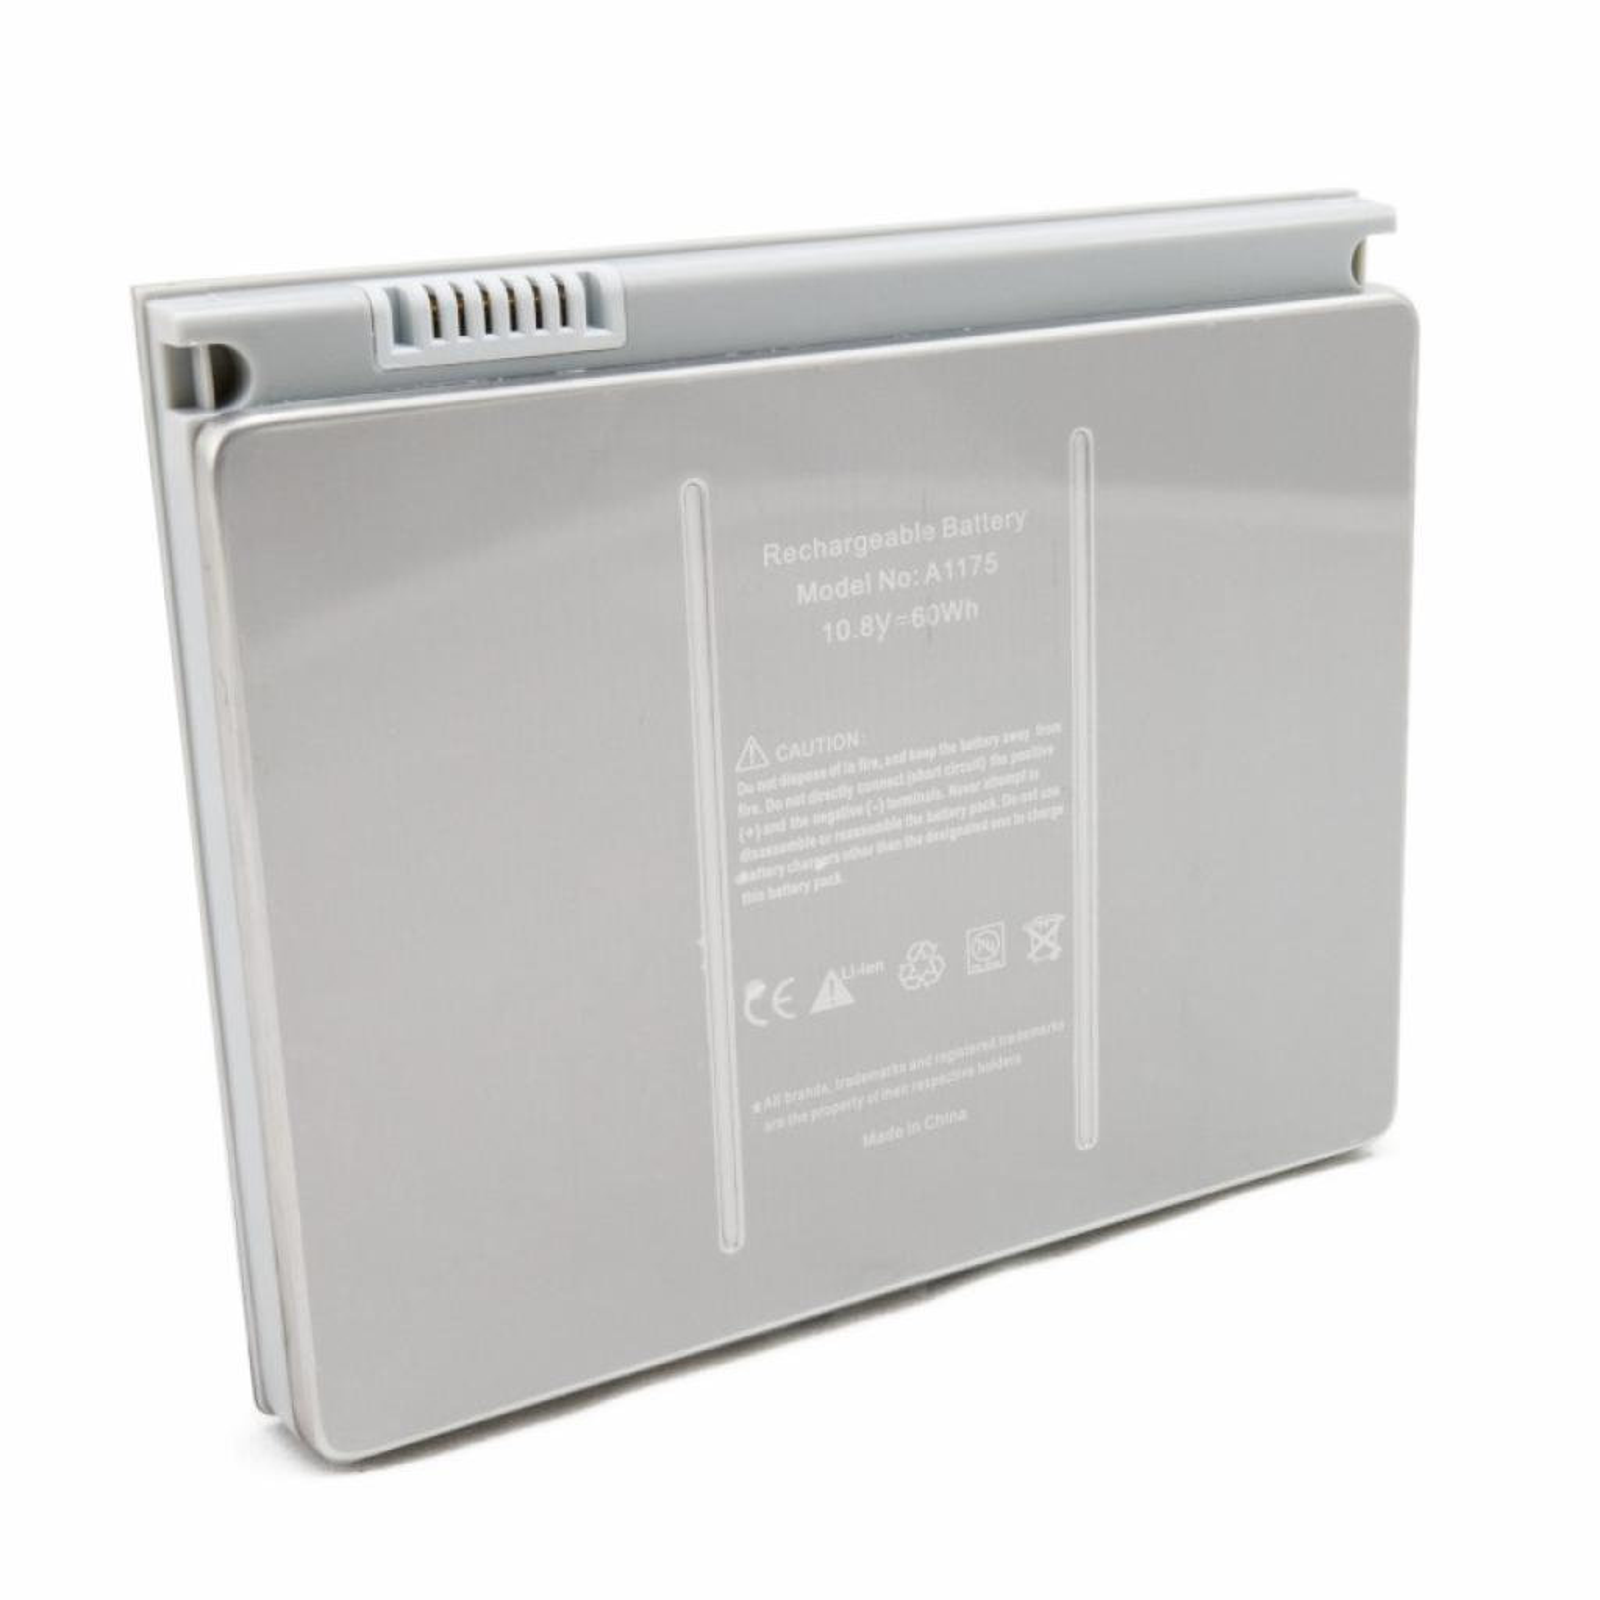 Аккумулятор для ноутбука Apple MacBook Pro 15 (A1175 Aluminum) 60Wh EXTRADIGITAL (BNA3917)